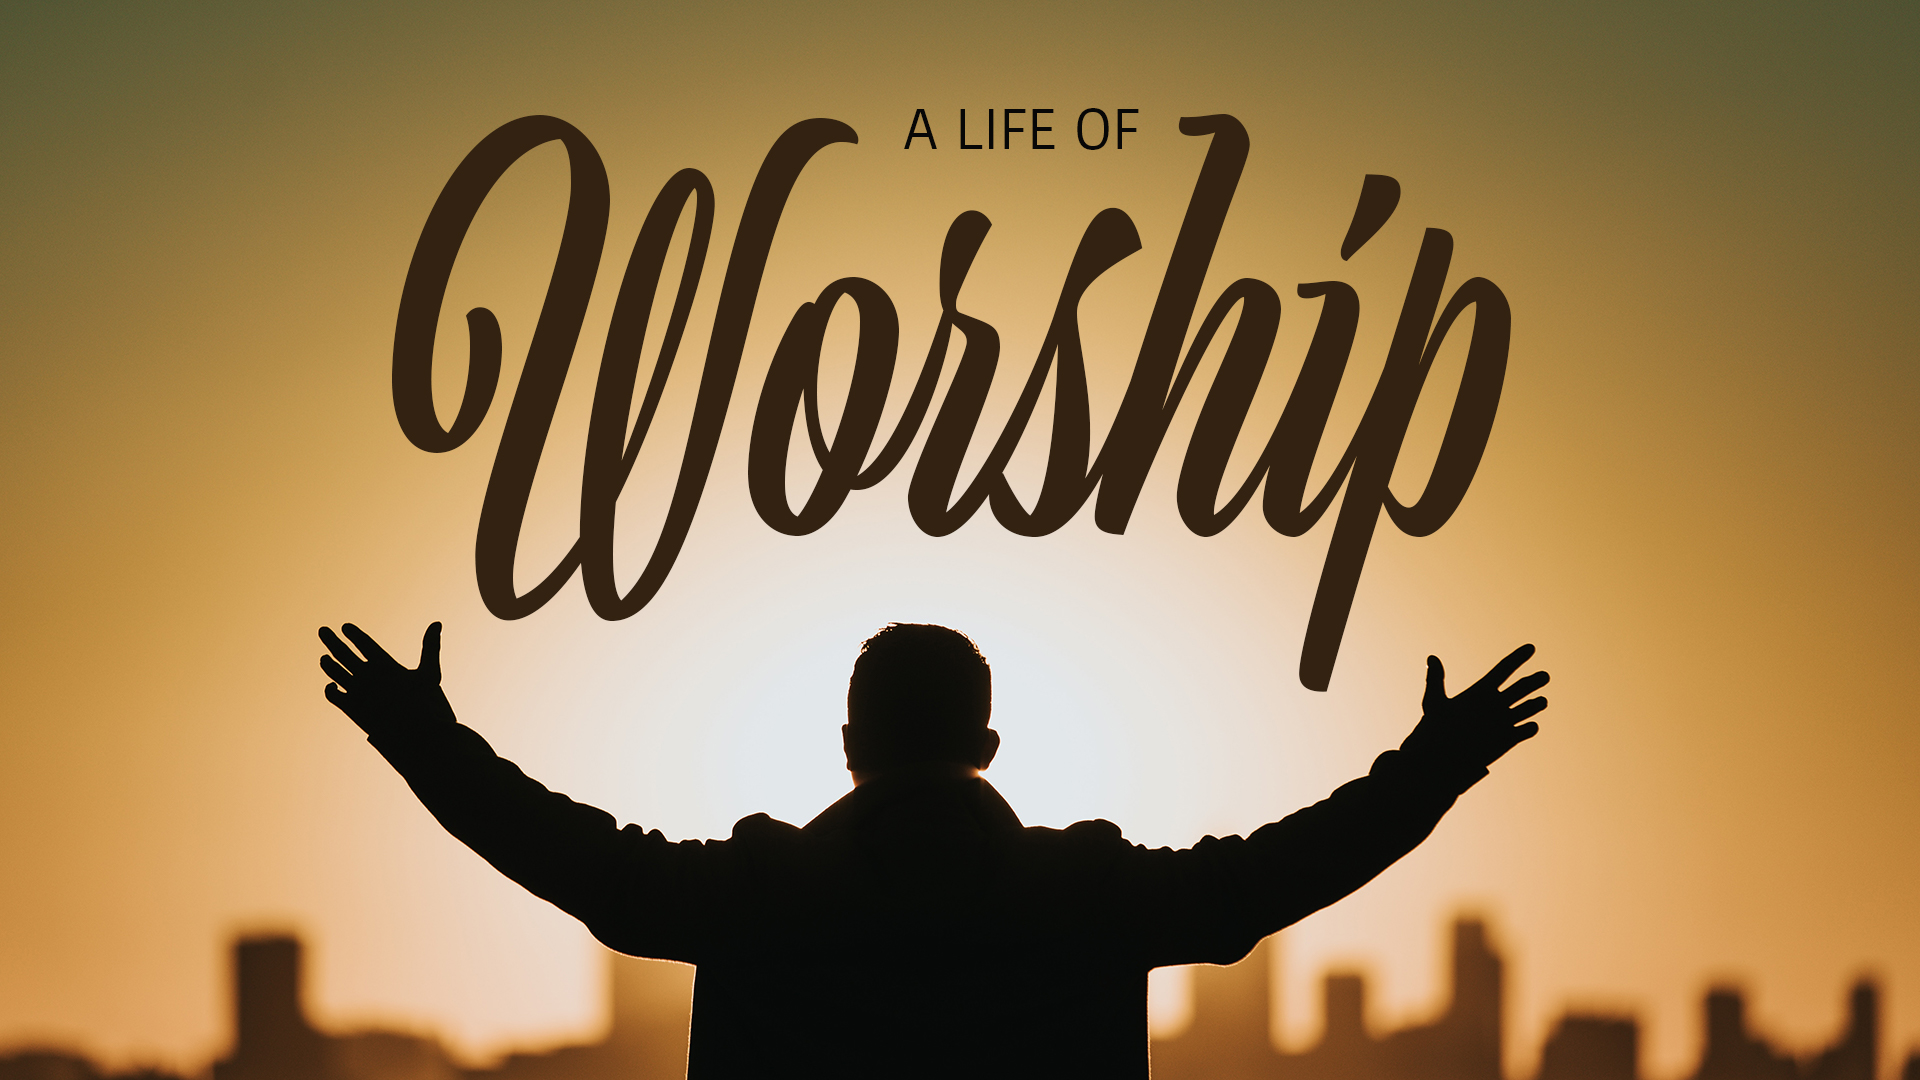 life-of-worship.jpg